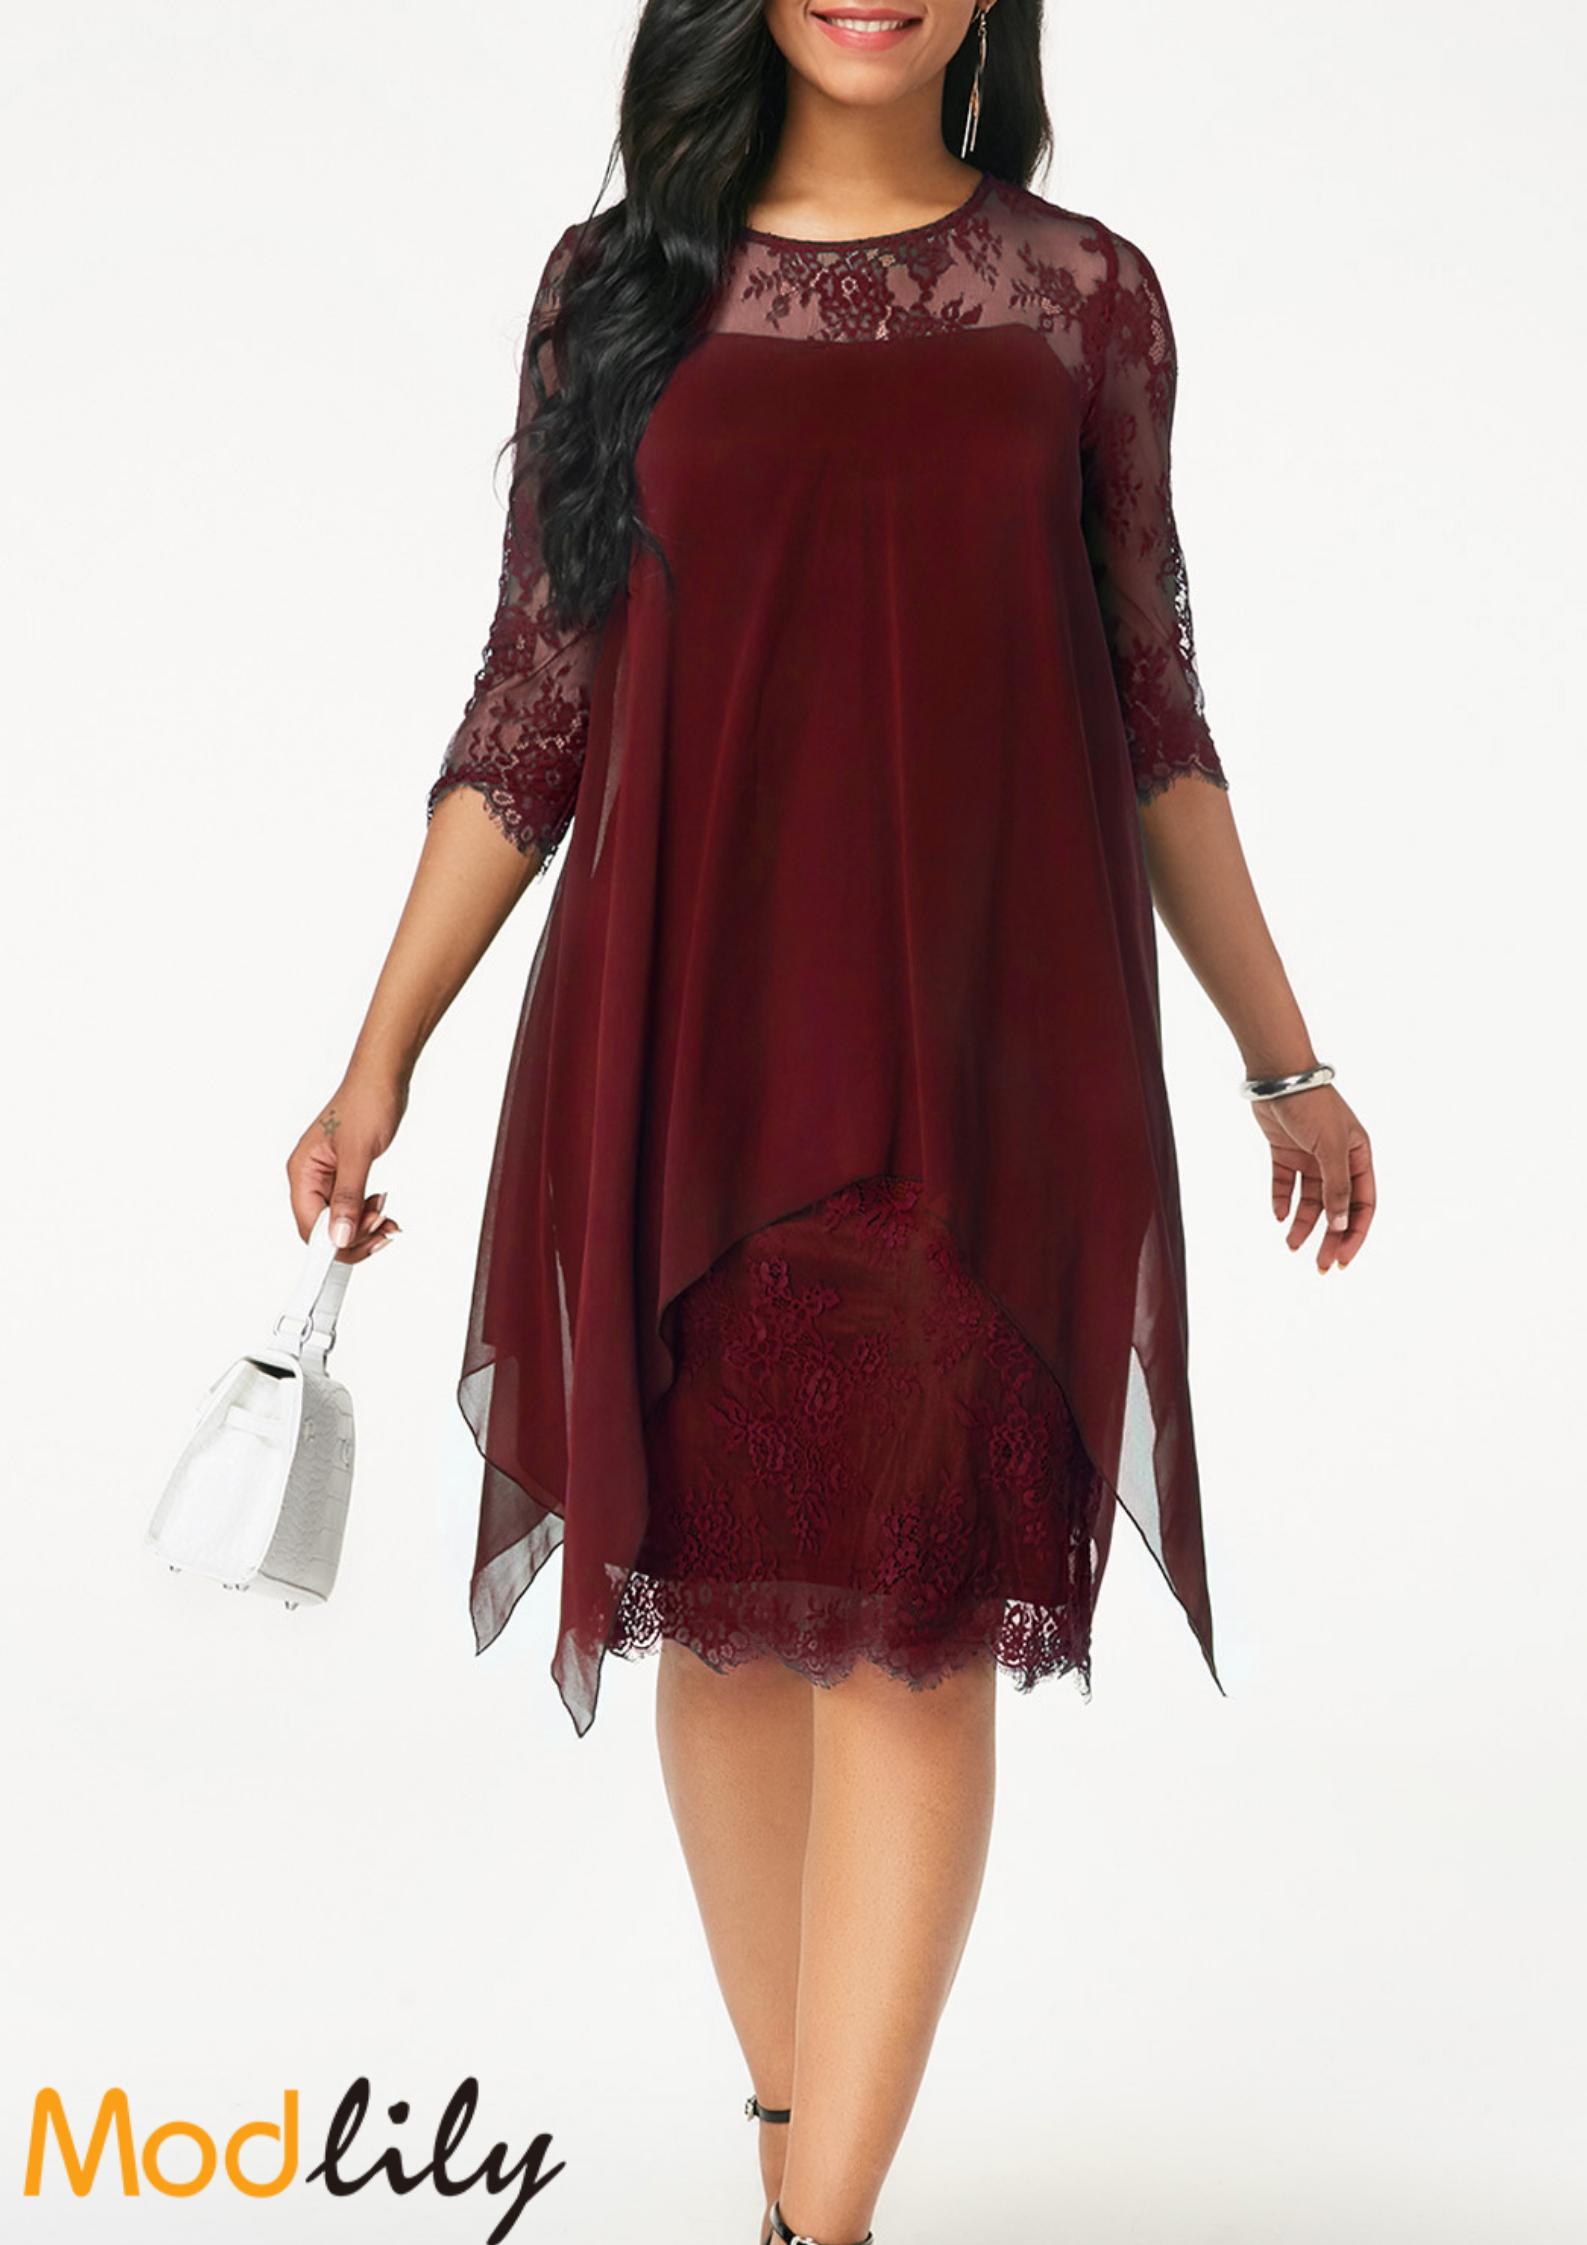 Round Neck Chiffon Overlay Lace Dress On Sale At Modlily. Free shipping. c90e7c71d338